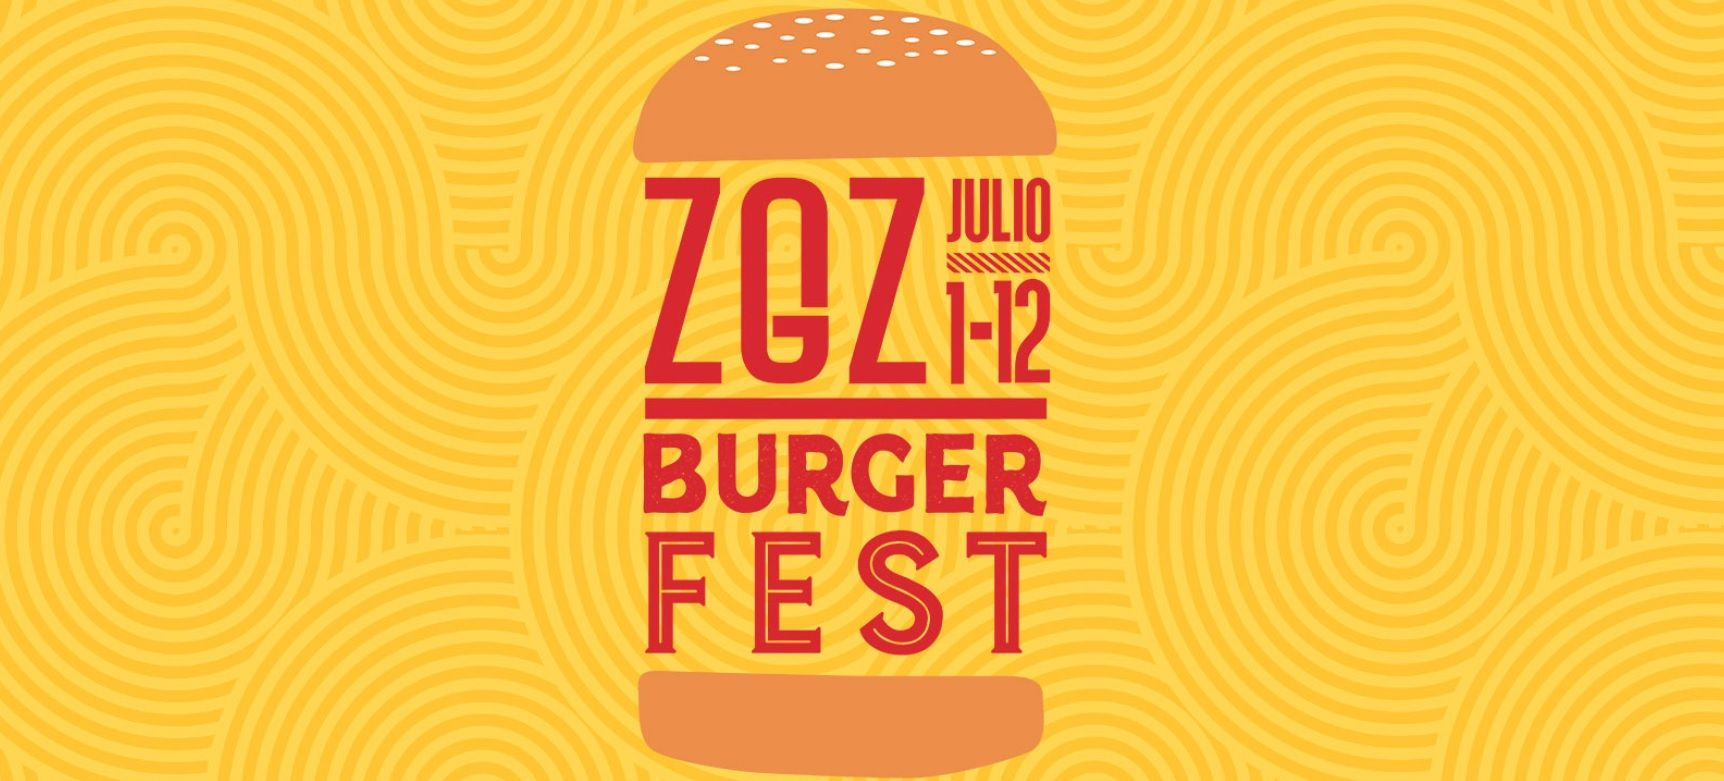 Zaragoza Burger Fest tercera edicion